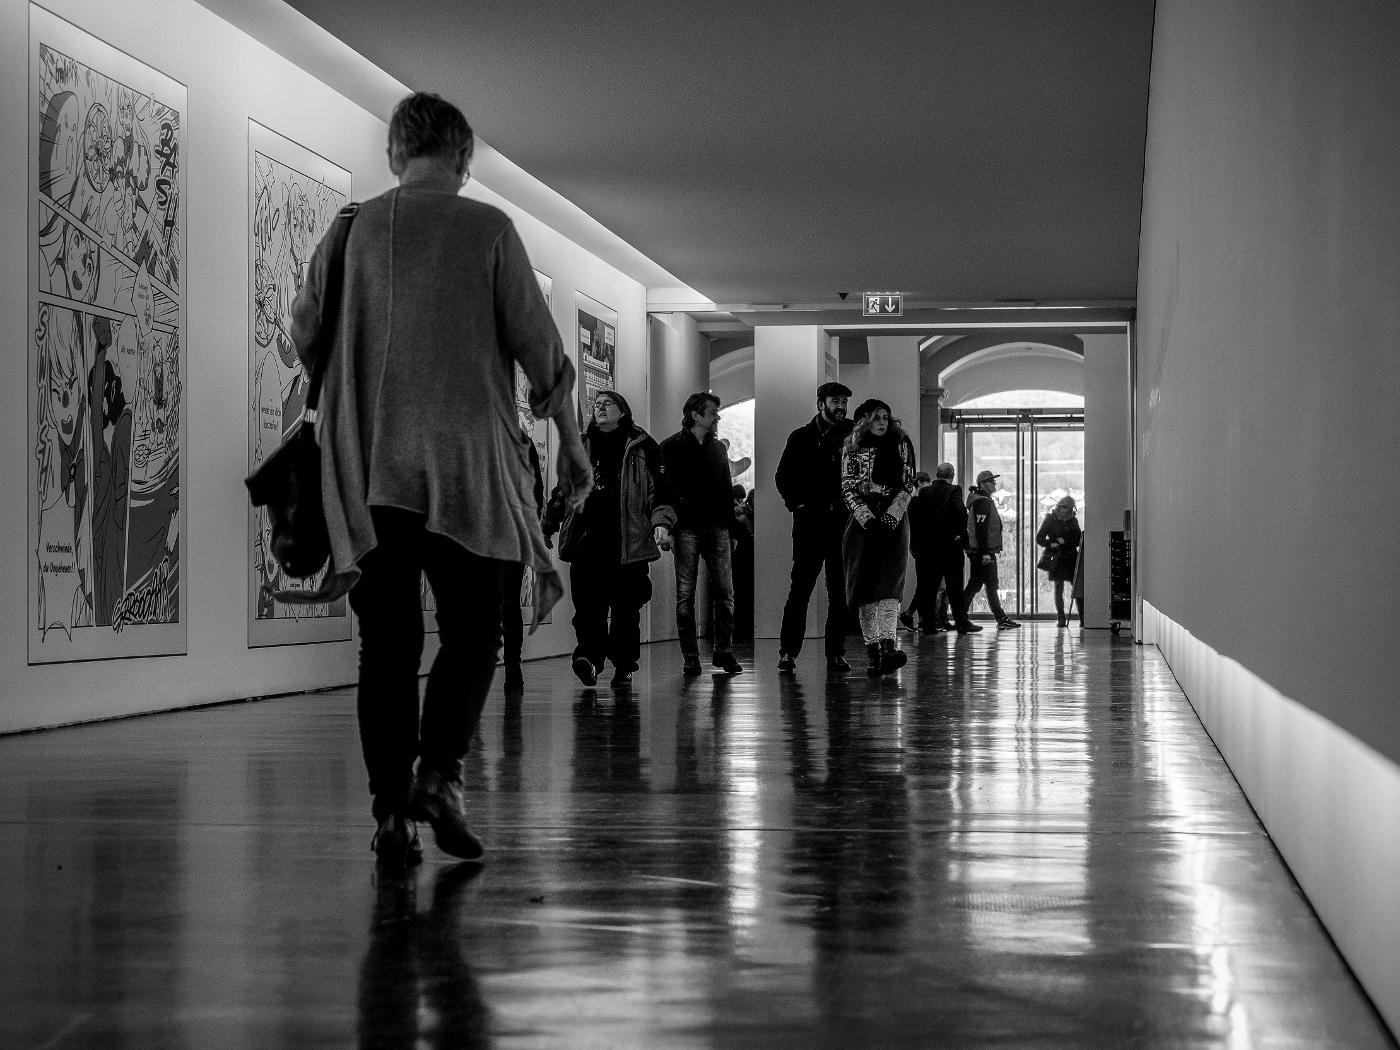 Arp Museum | Tunnel unter der Bahn | © wolfgang röser | worobo